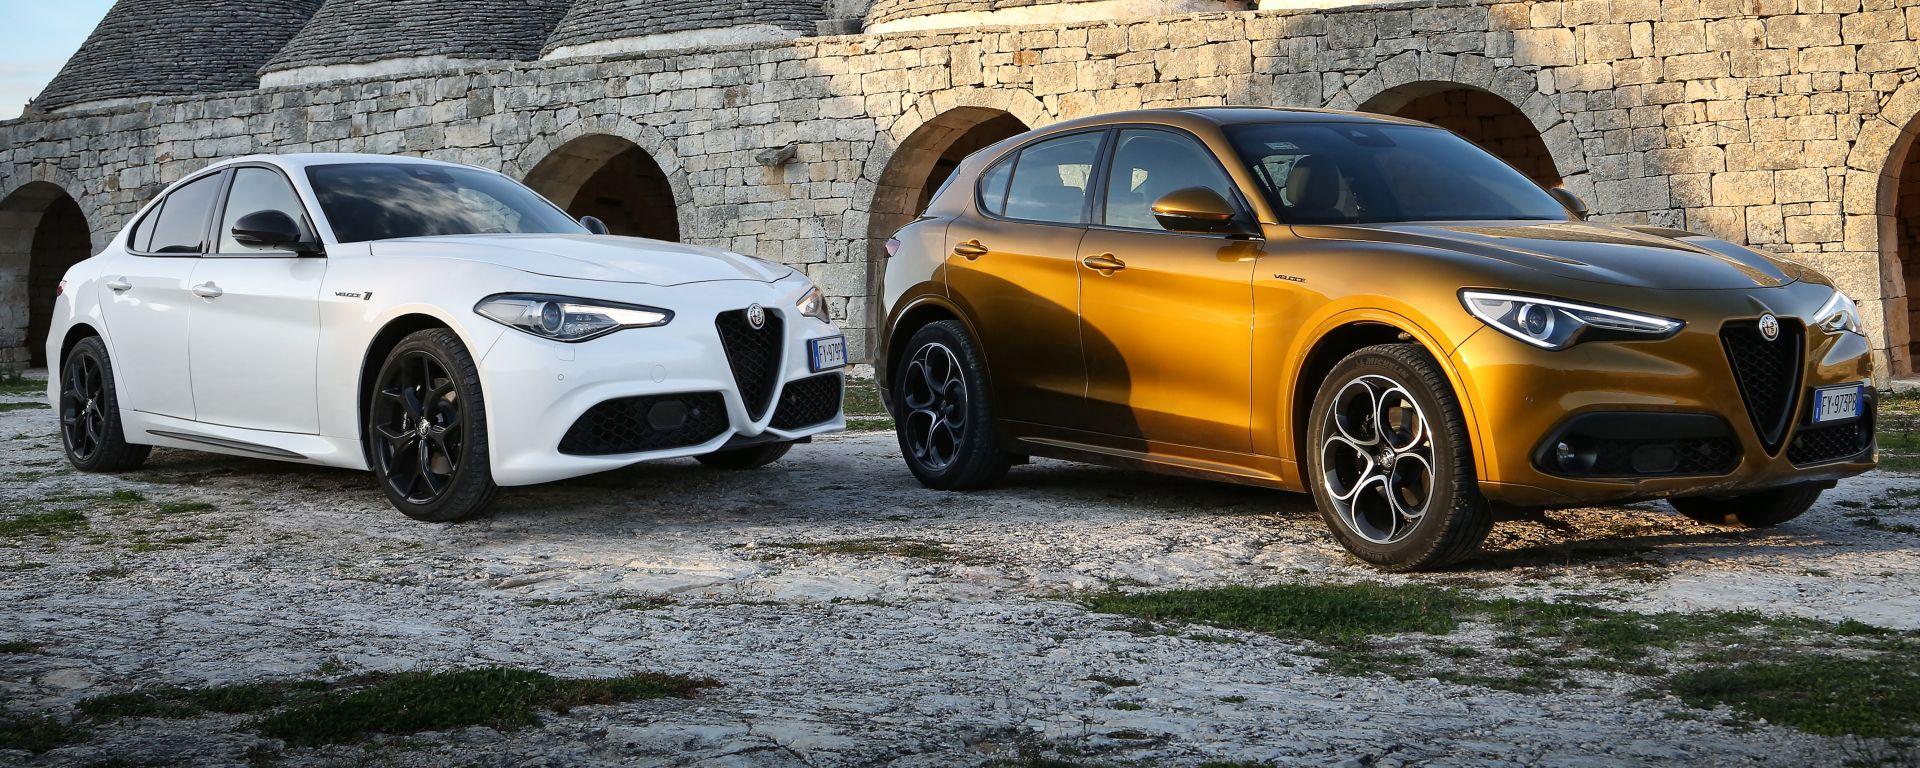 Alfa Romeo Giulia e Stelvio 2020